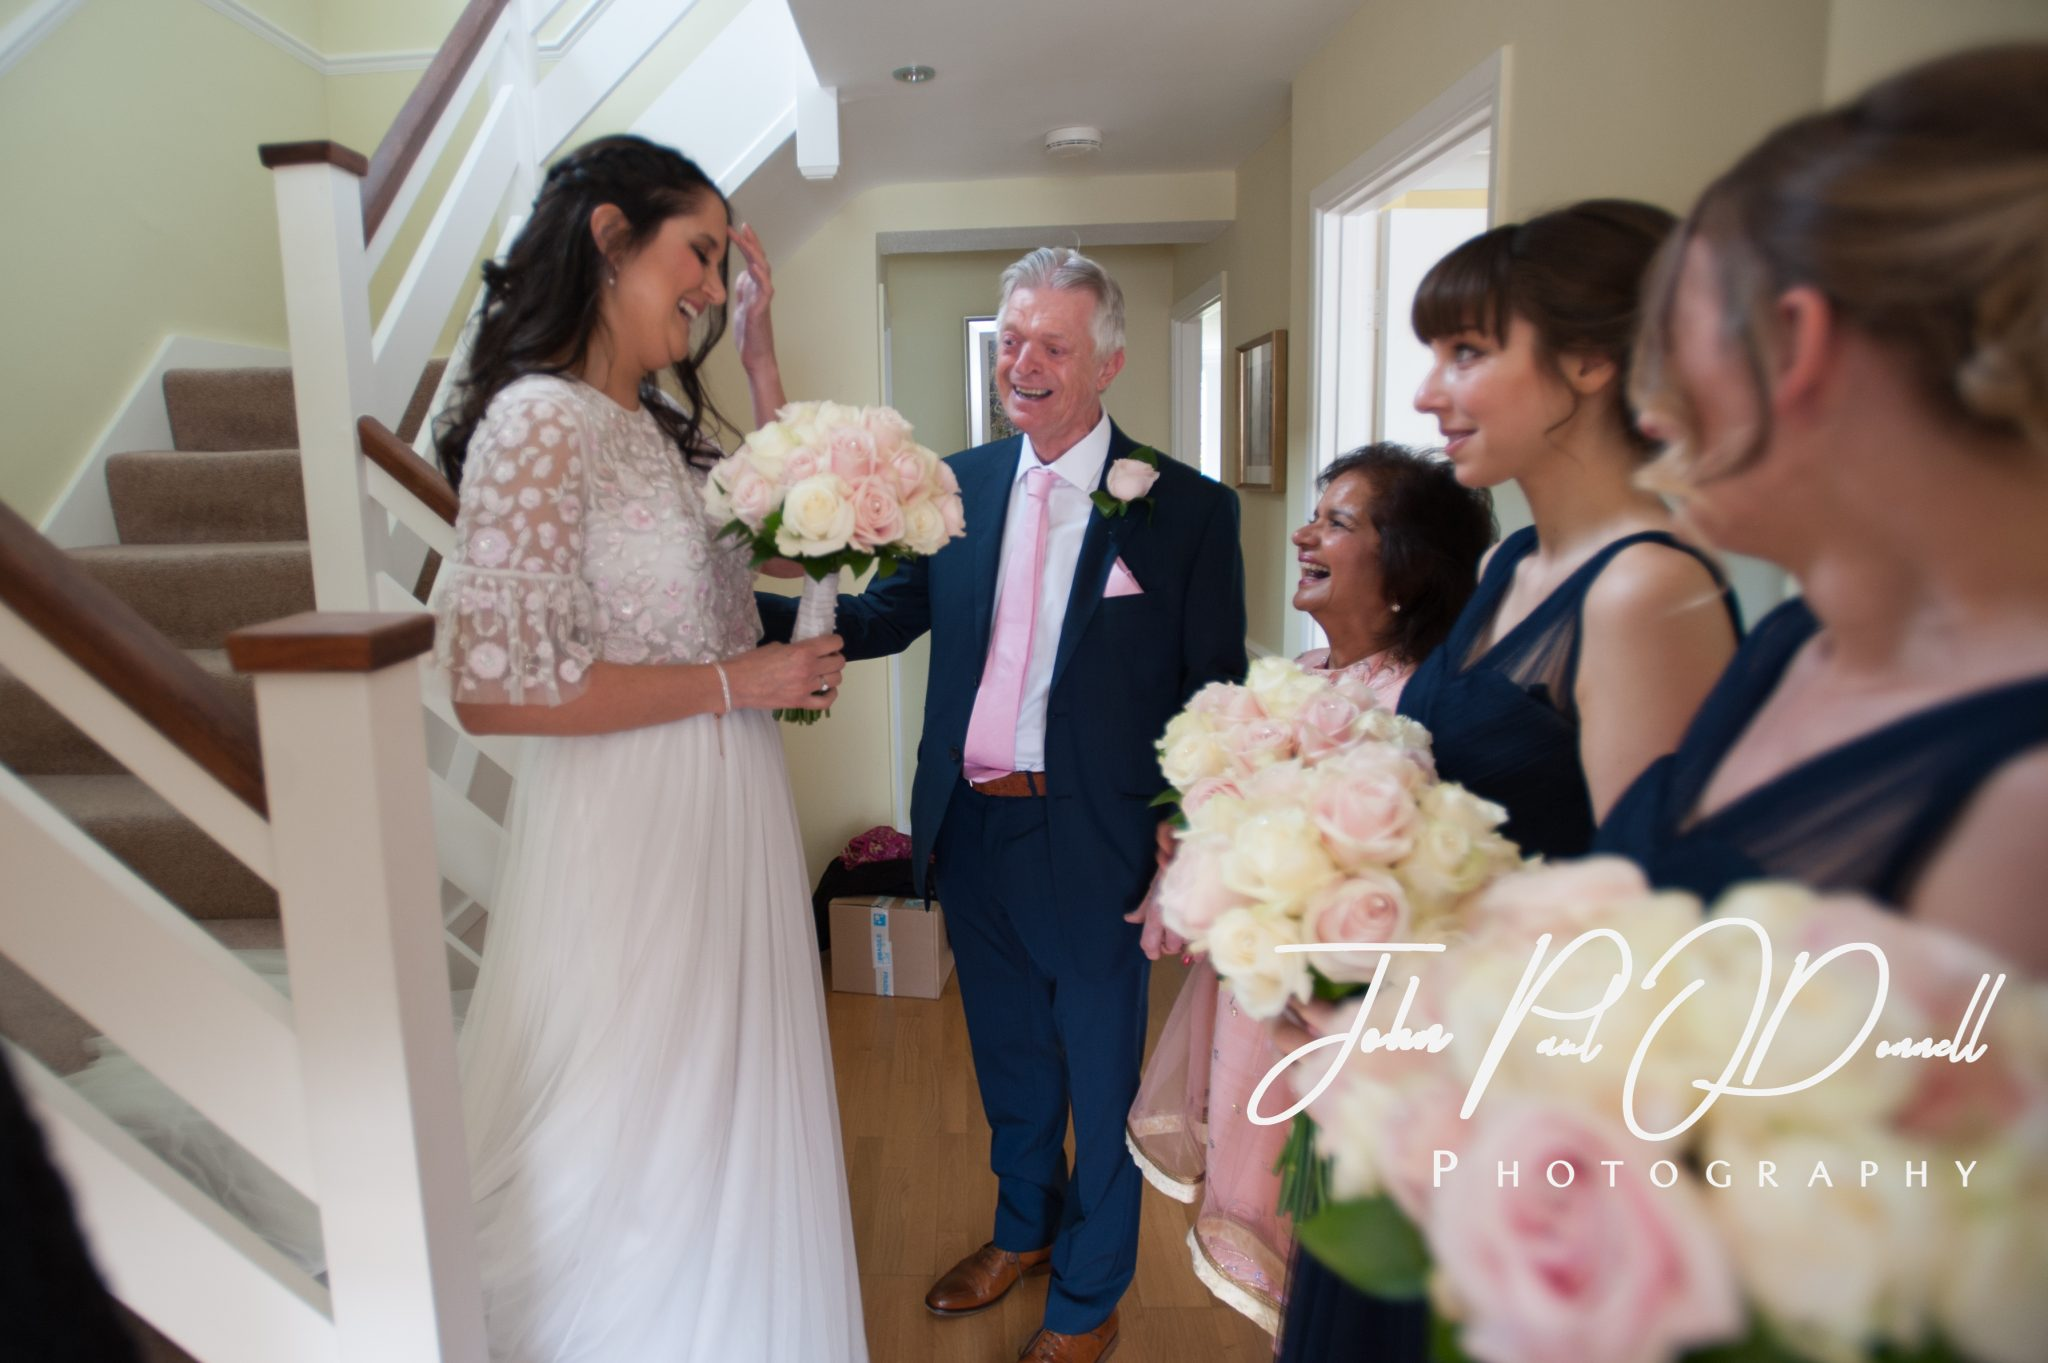 Wedding Photography Mercure Hotel St albans - Anthony and Sarah